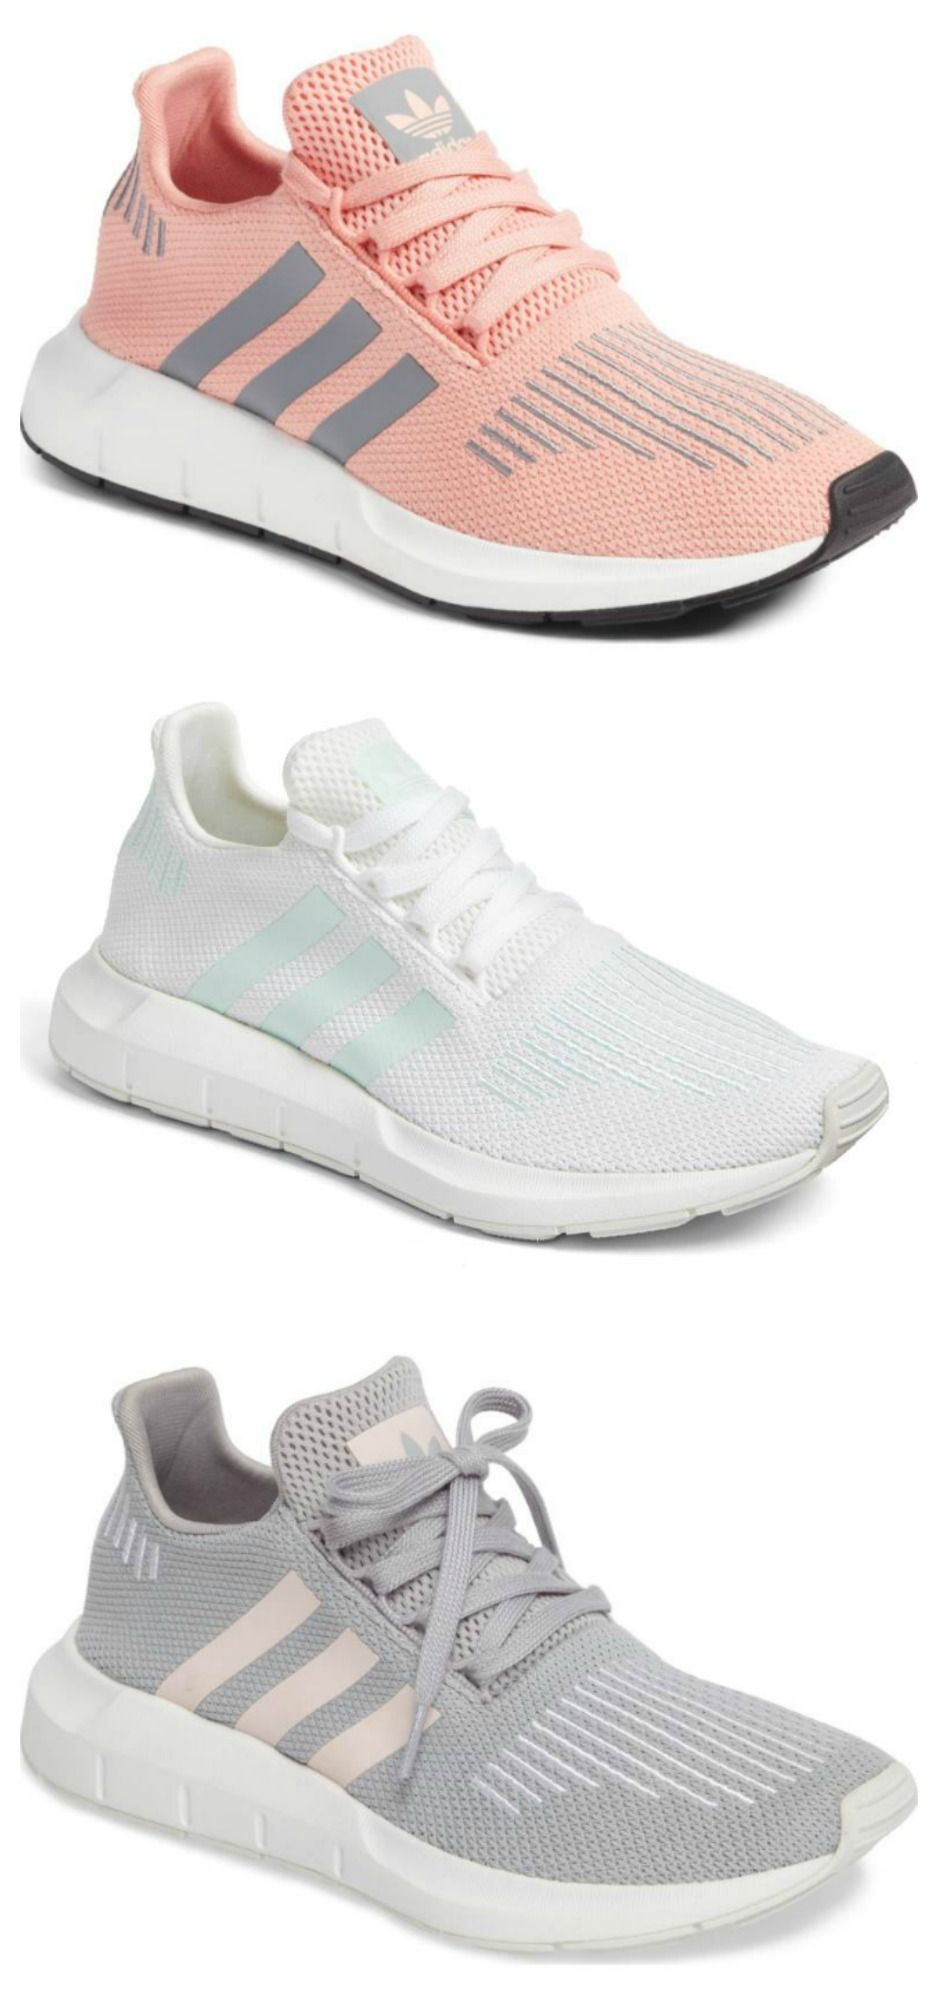 8a6932c27ec9f Adidas Swift Run Sneakers via Nordstrom